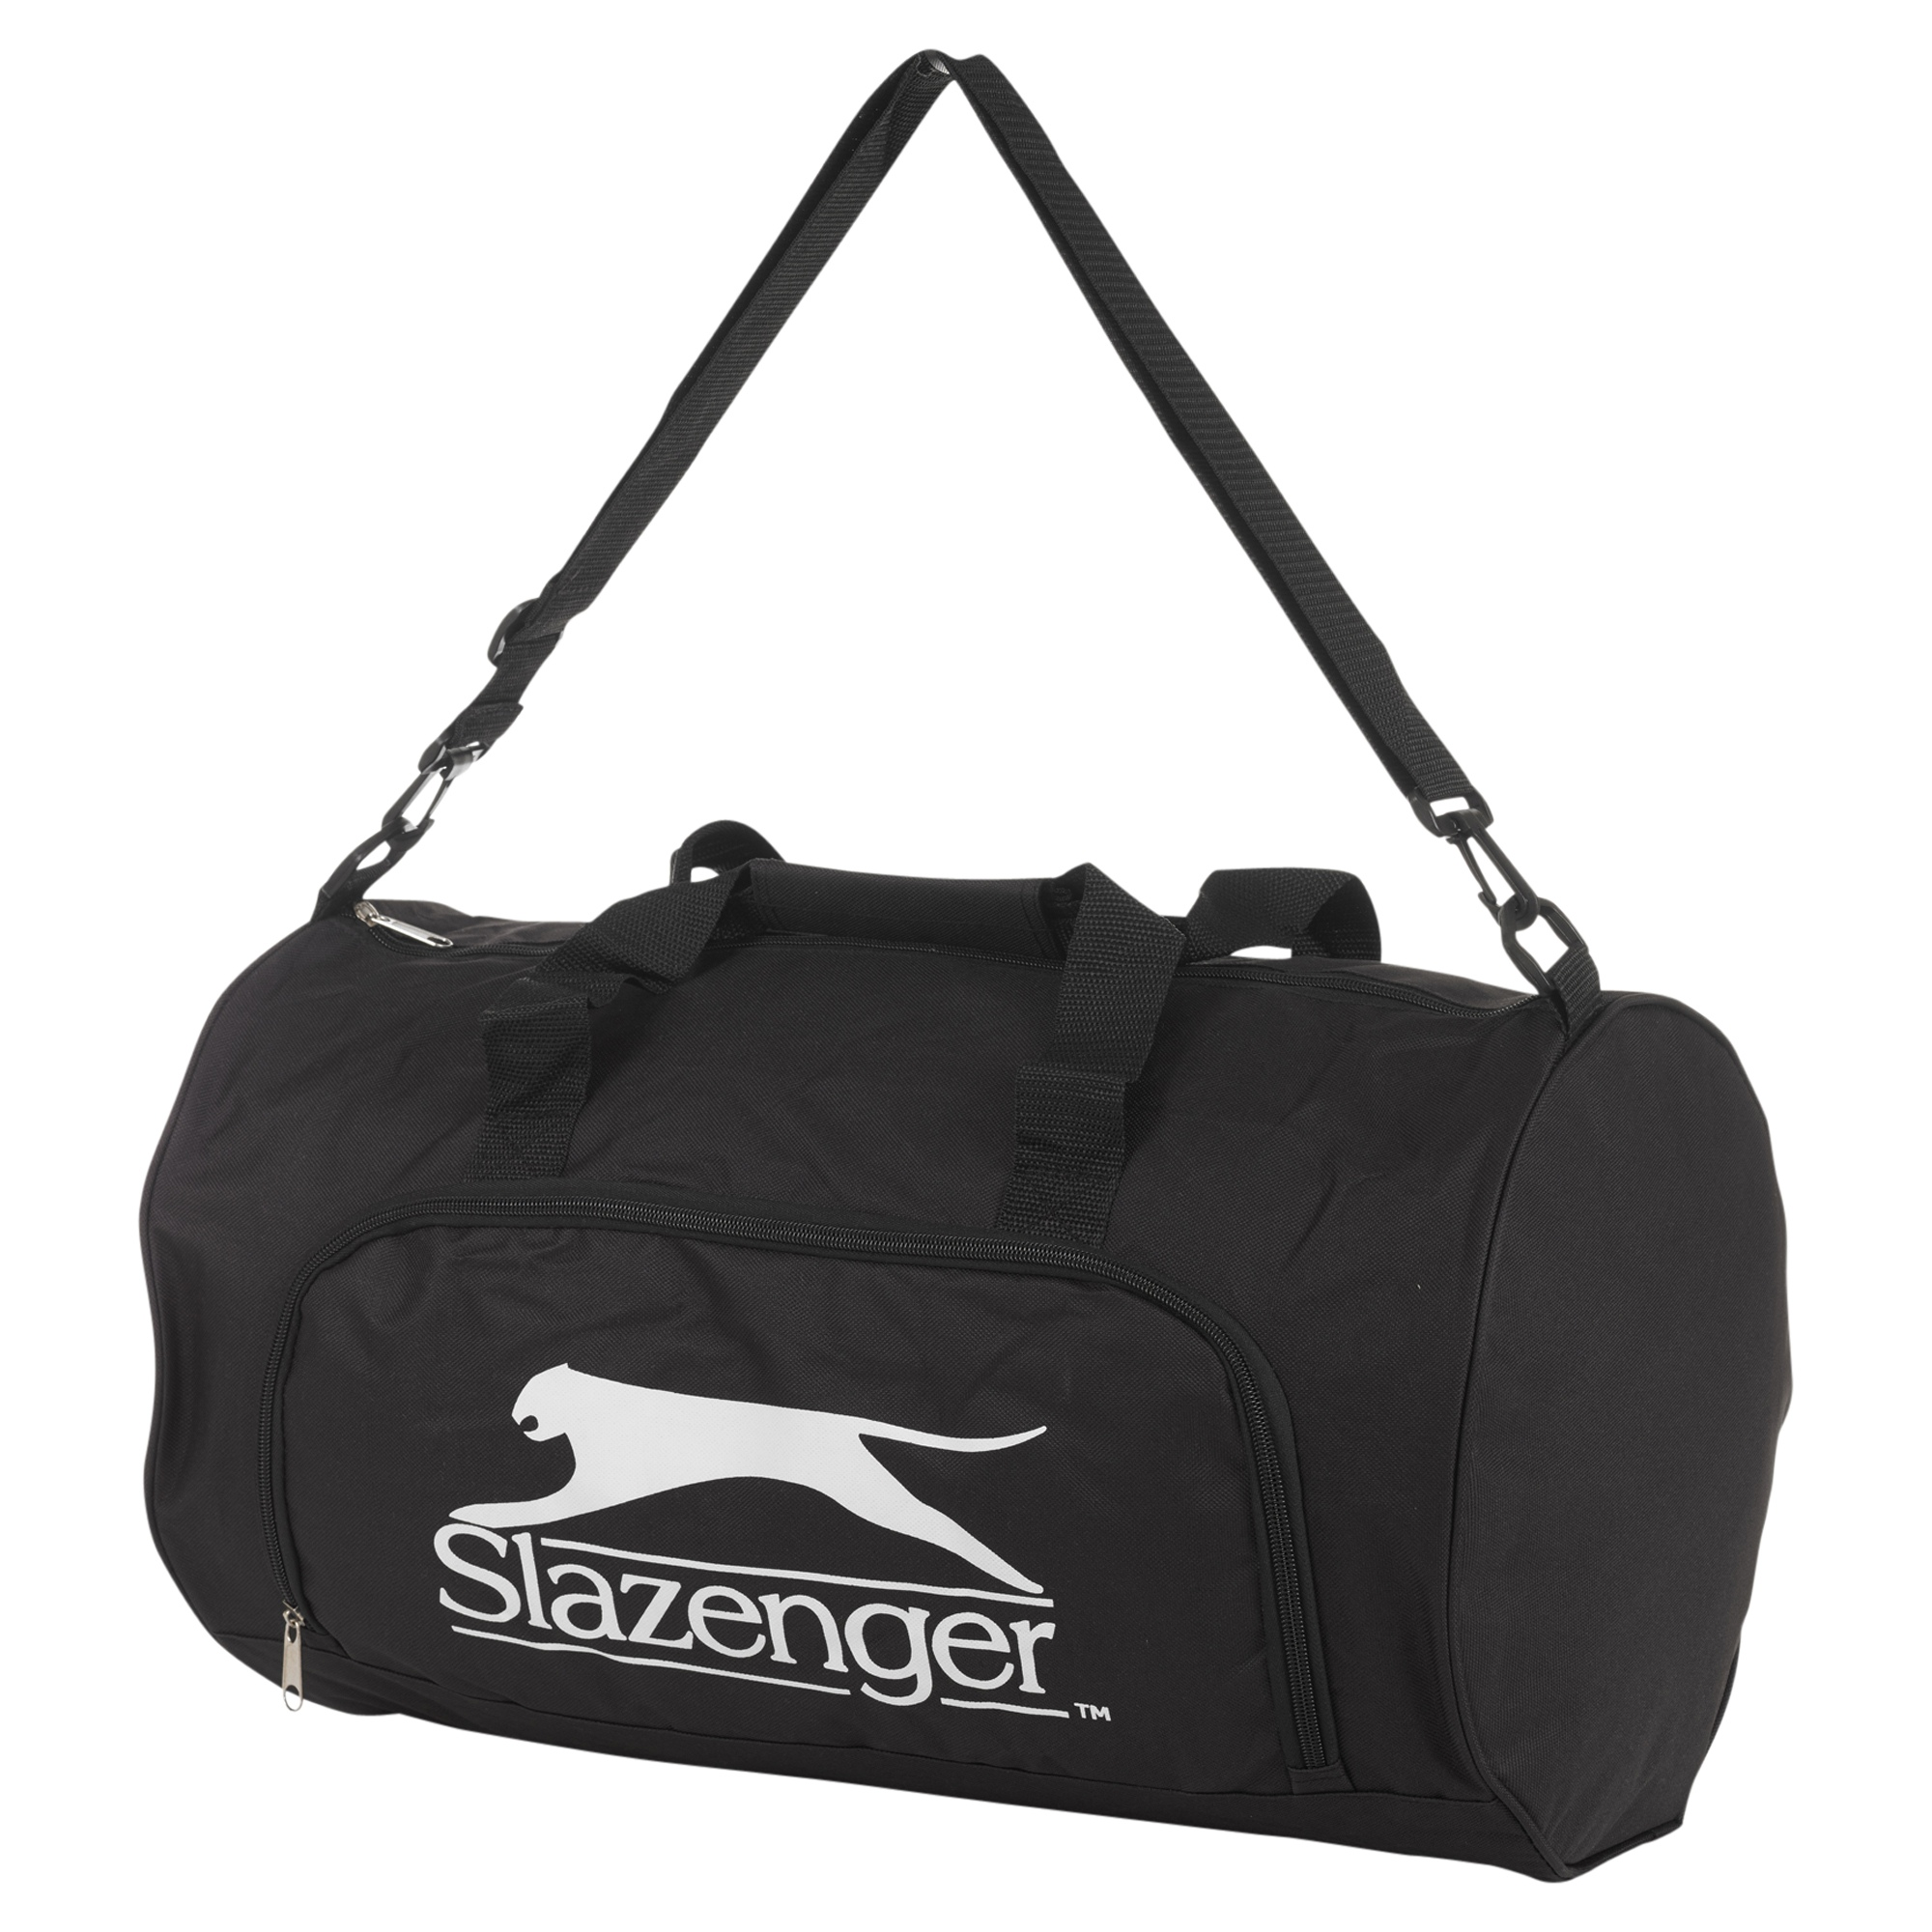 Slazenger Sports Gym Holdall Bag Travel Lightweight Luggage